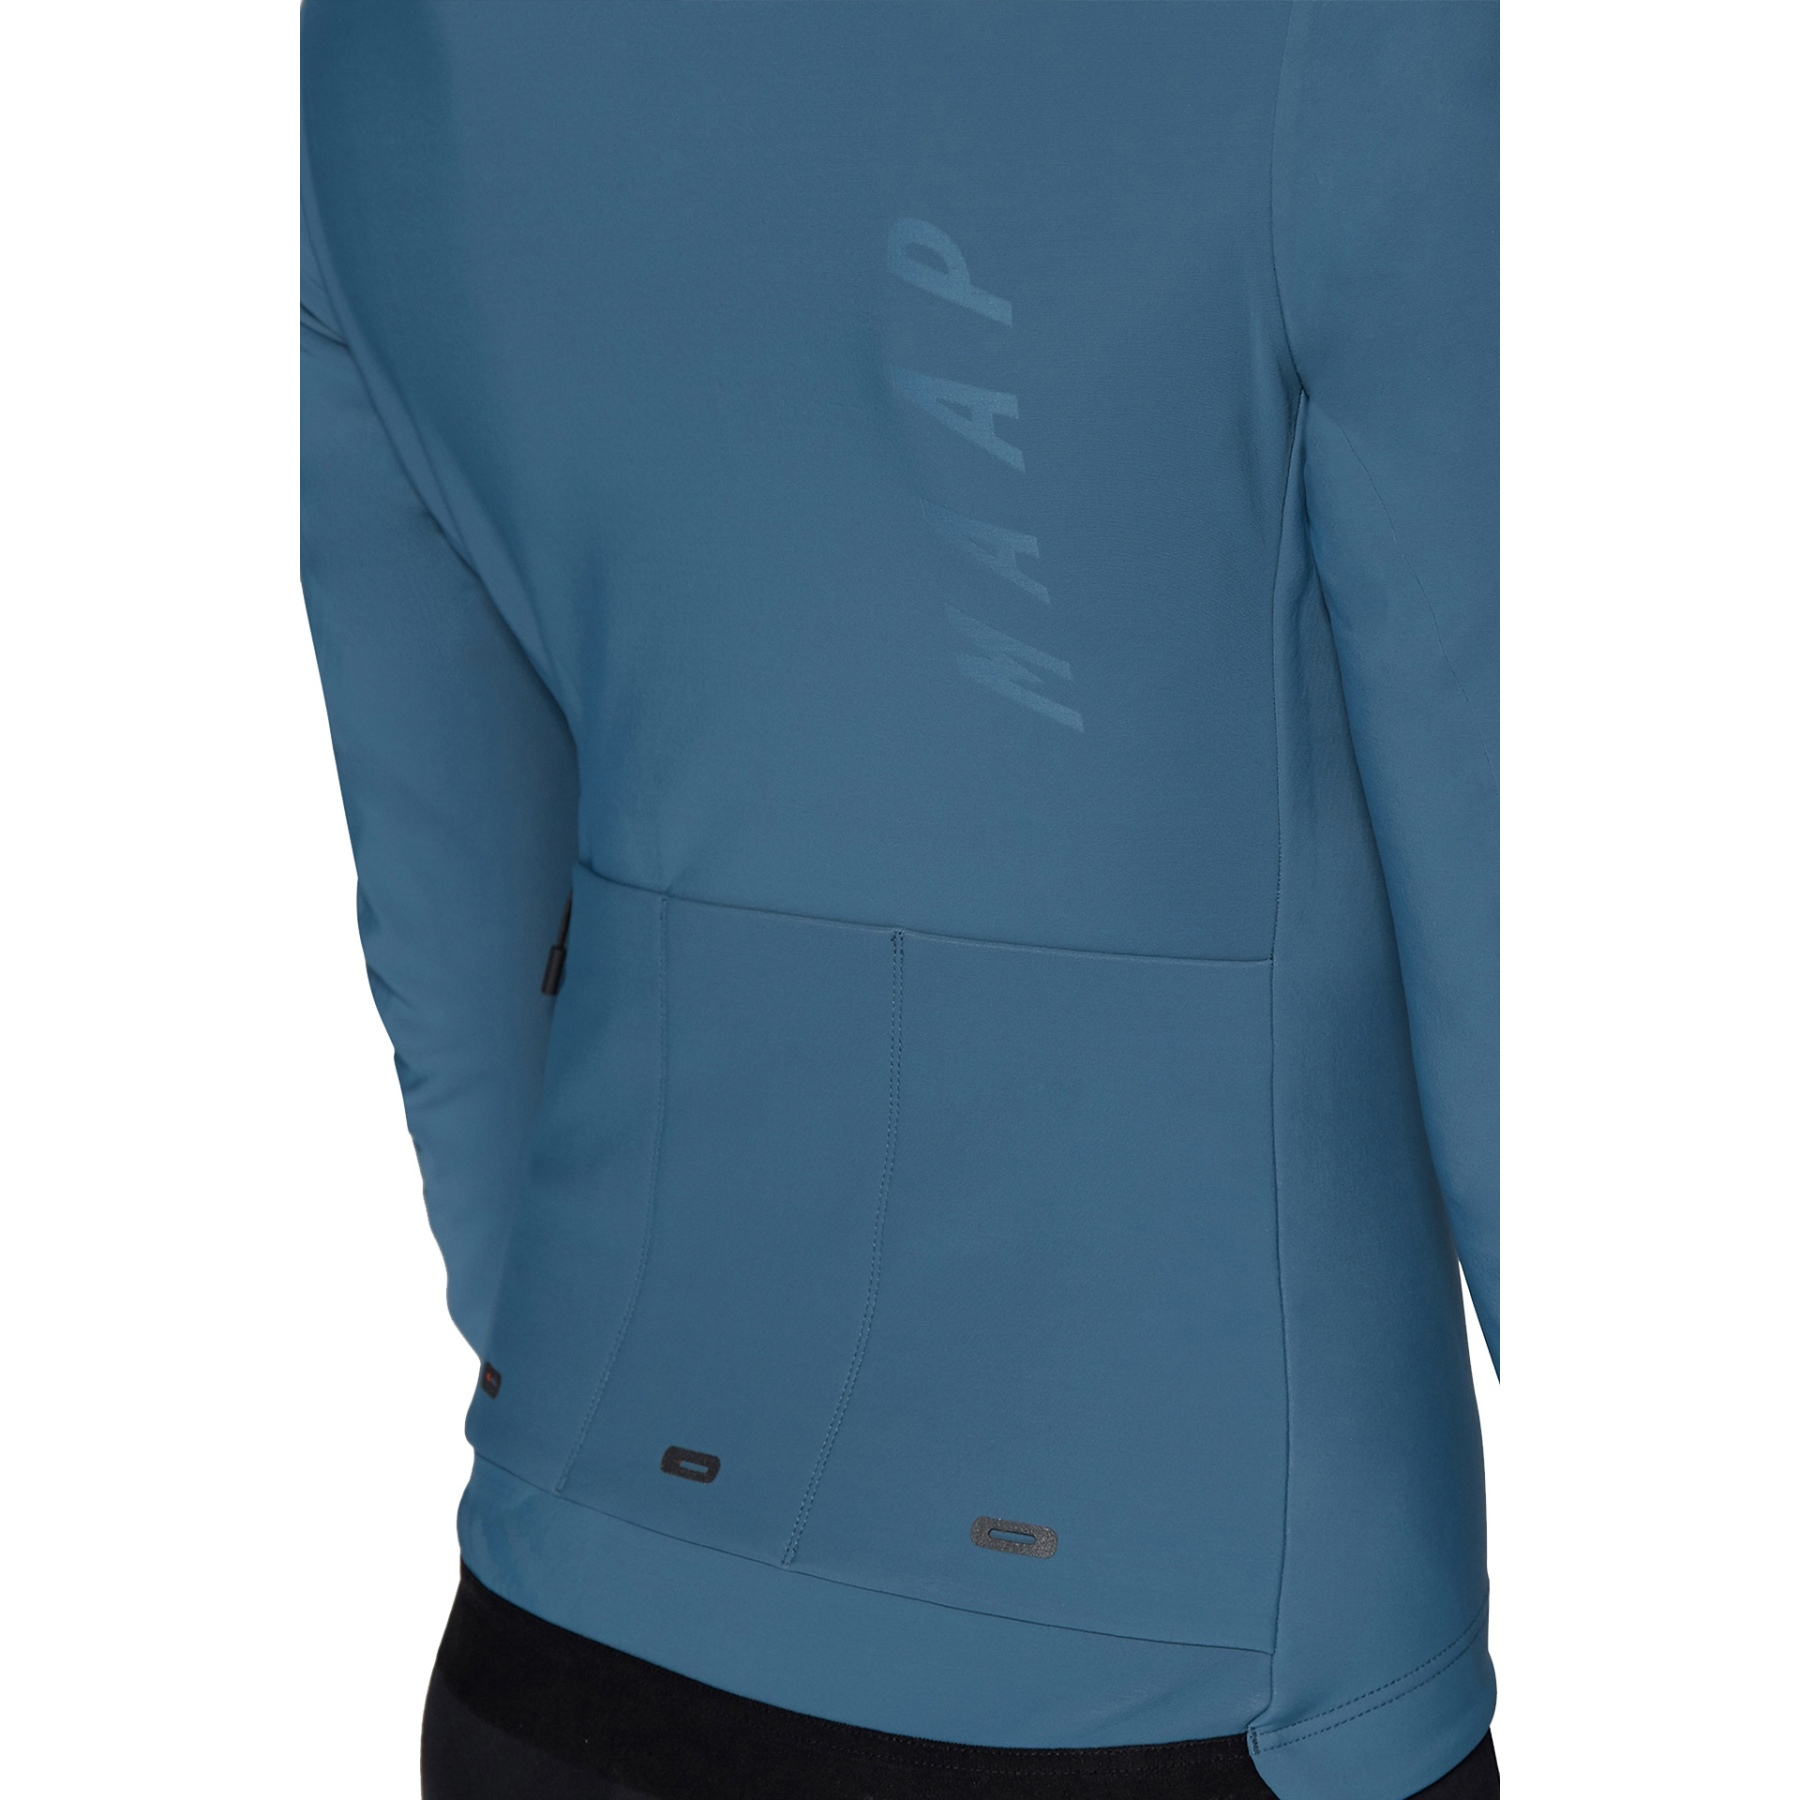 Image of MAAP Women's Apex Winter Jacket 2.0 - blue stone